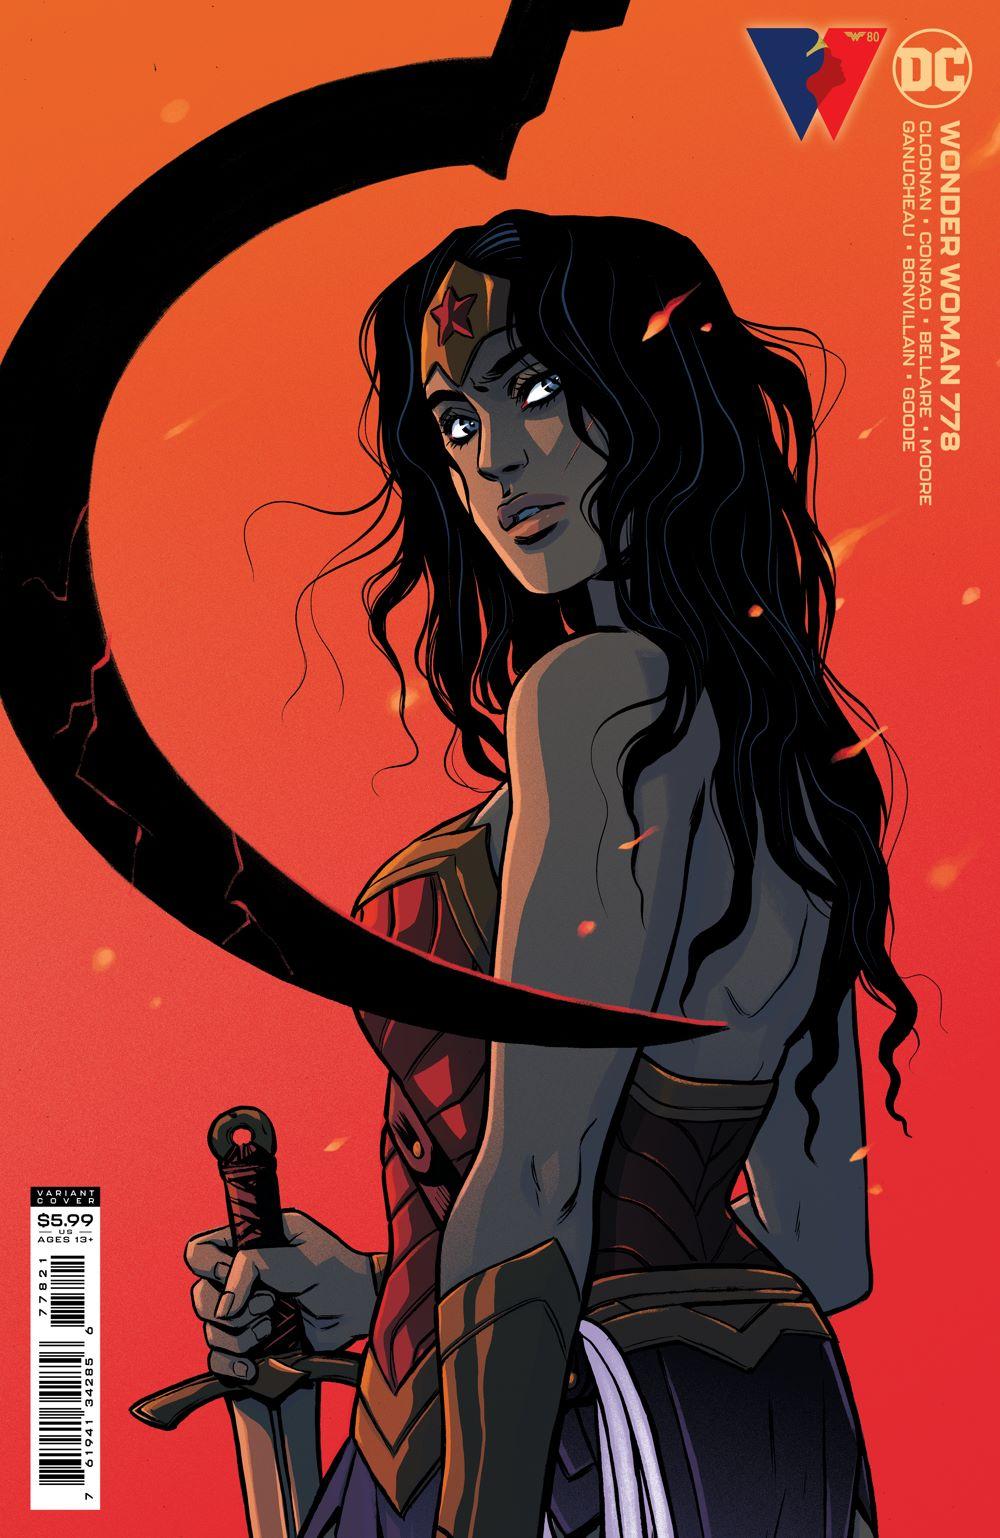 WONDERWOMAN_Cv778_var_77821 DC Comics August 2021 Solicitations